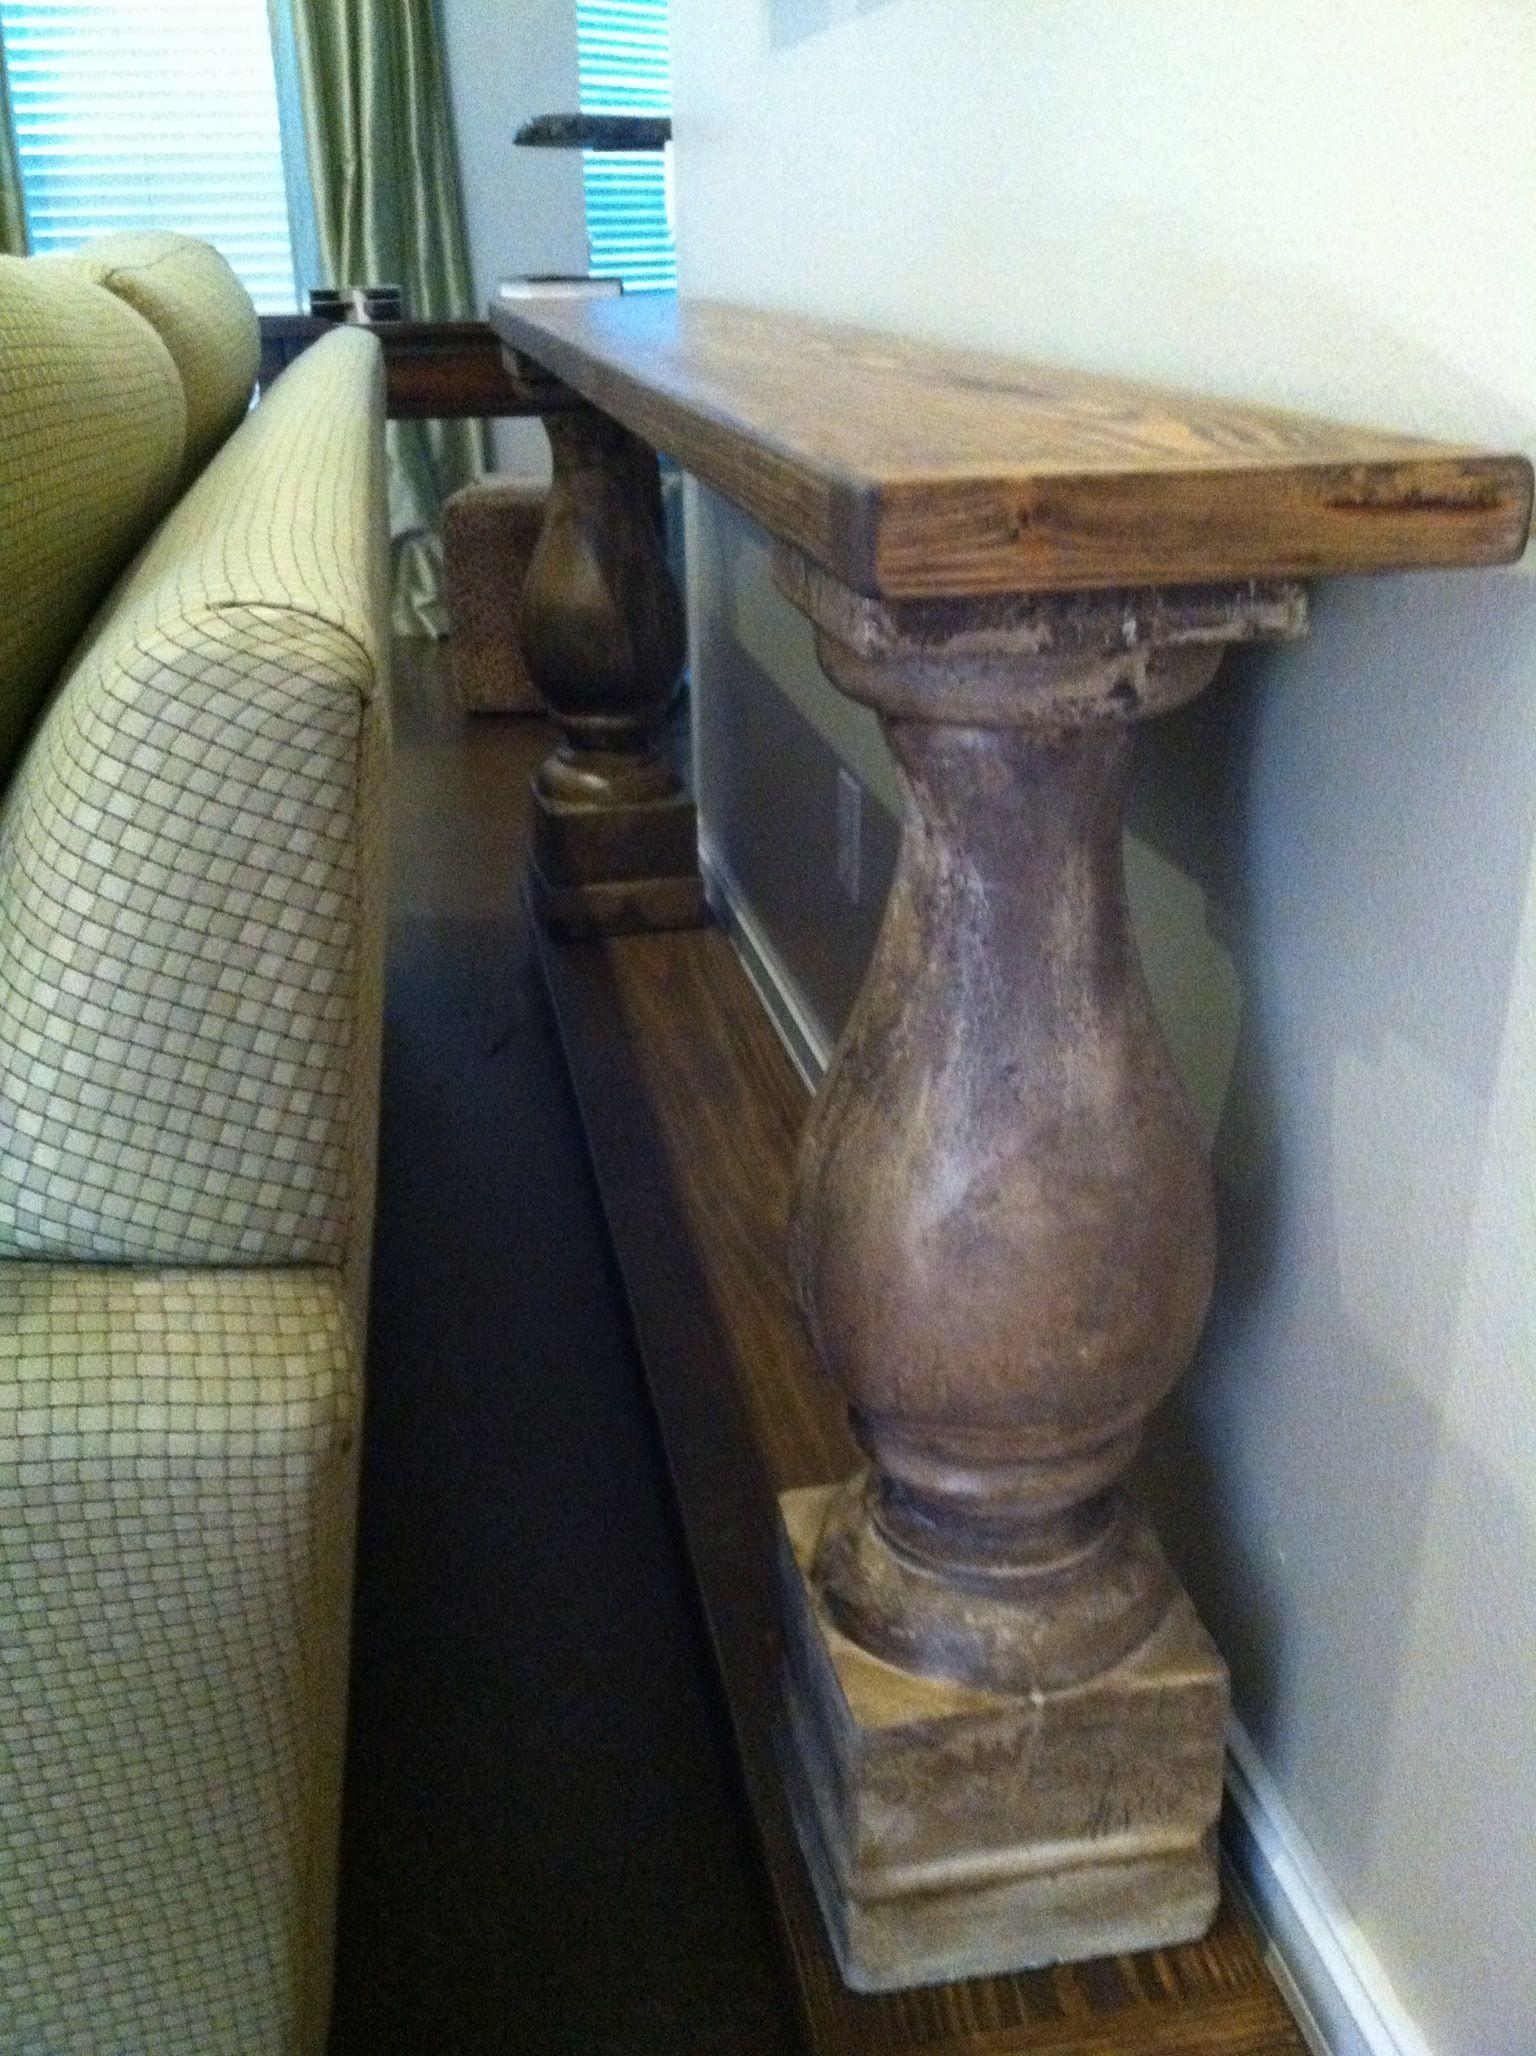 My Restoration Hardware like knockoff balustrade console table I